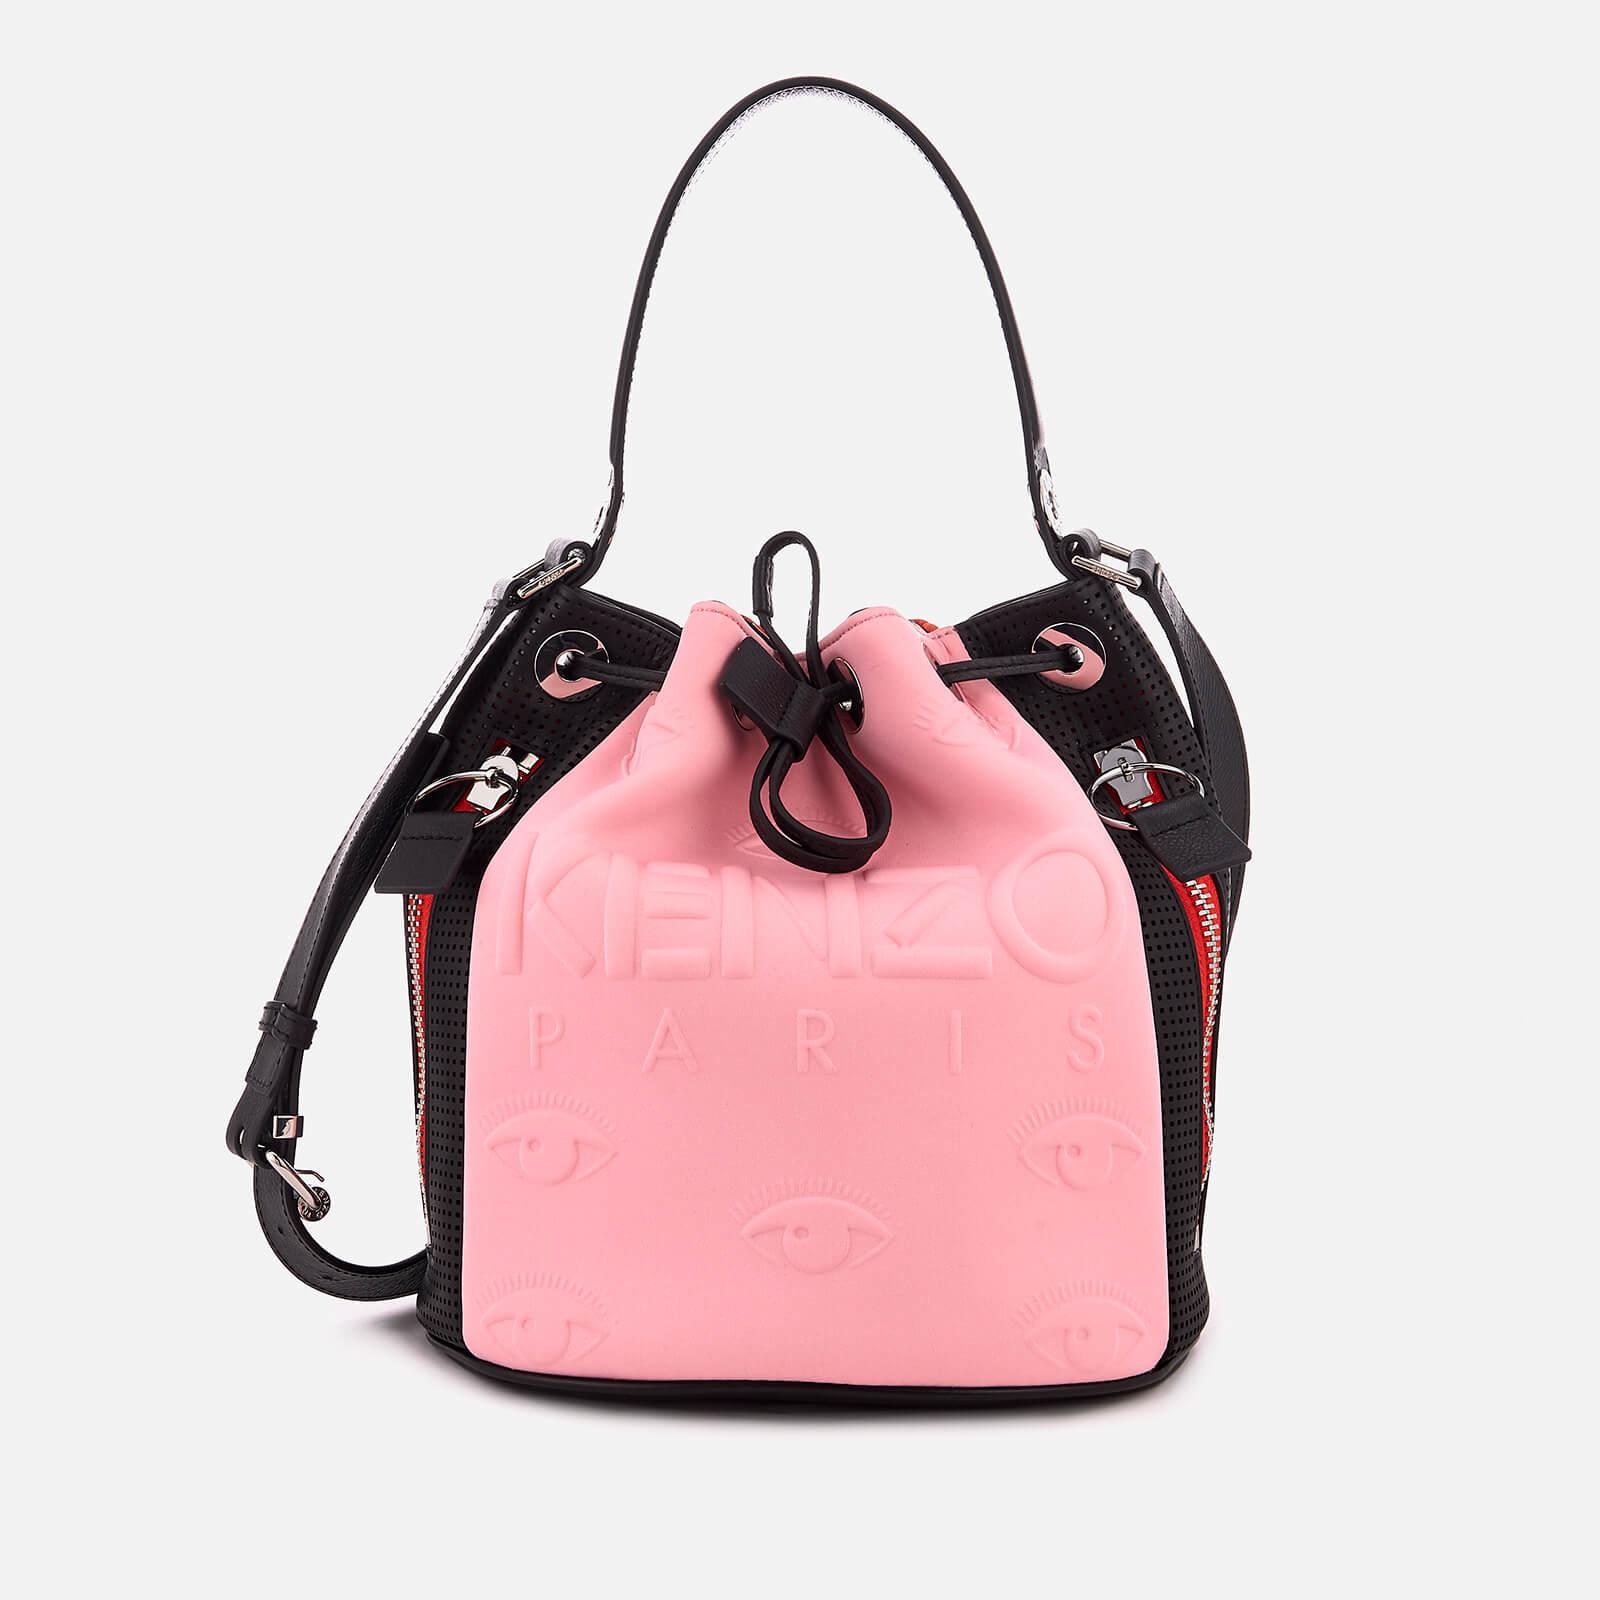 417e5f301d KENZO Women's Kanvas Bucket Bag - Flamingo Pink - Free UK Delivery over £50